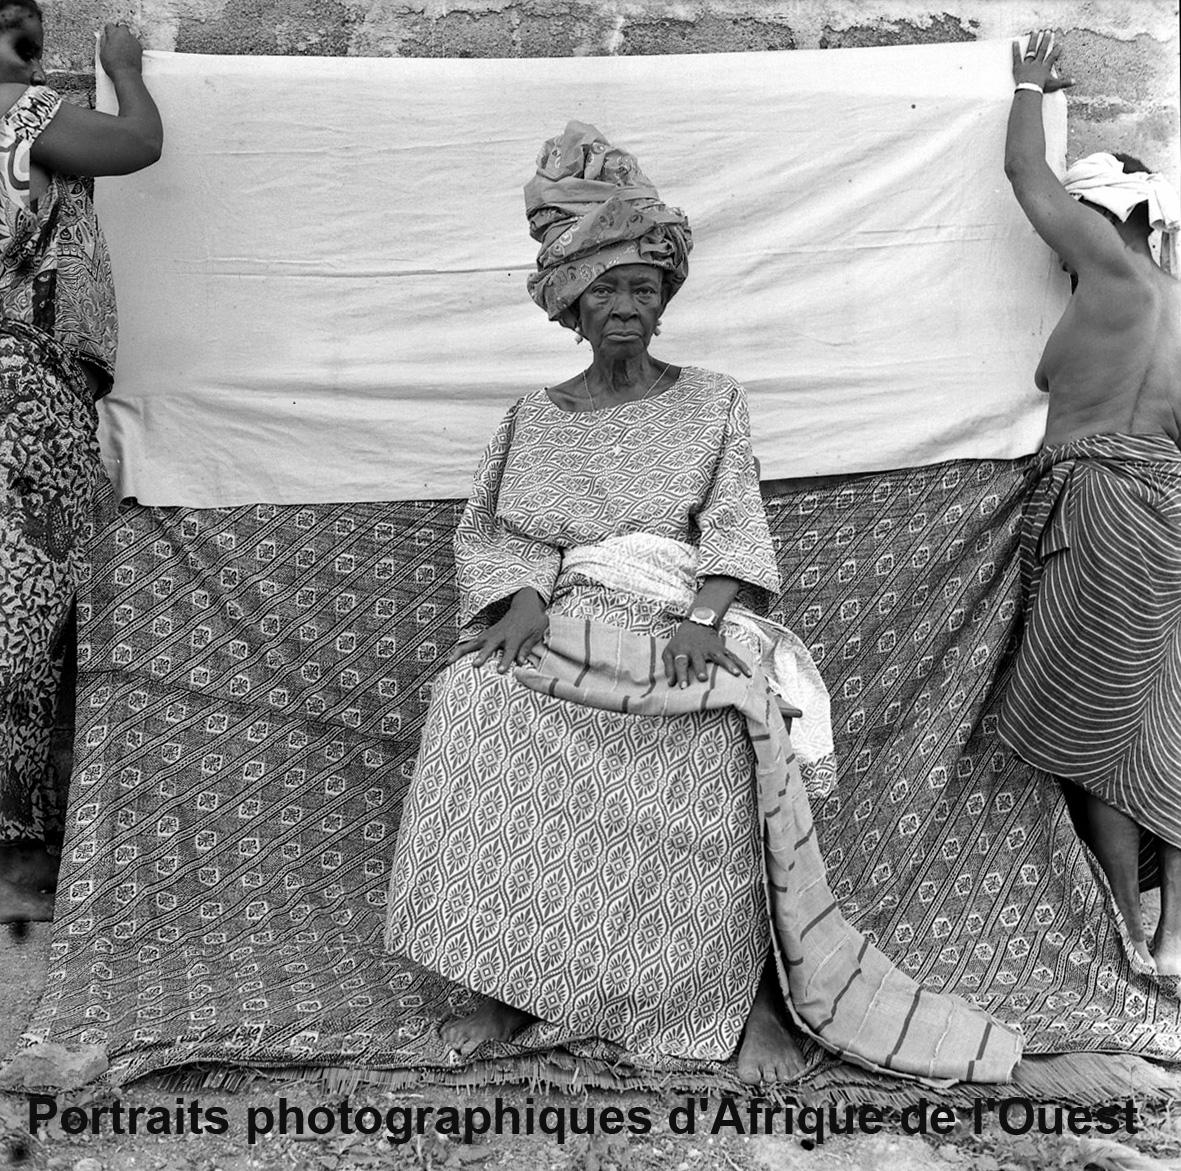 Portraits de Studio d'Afrique/Africa Studio Portraits